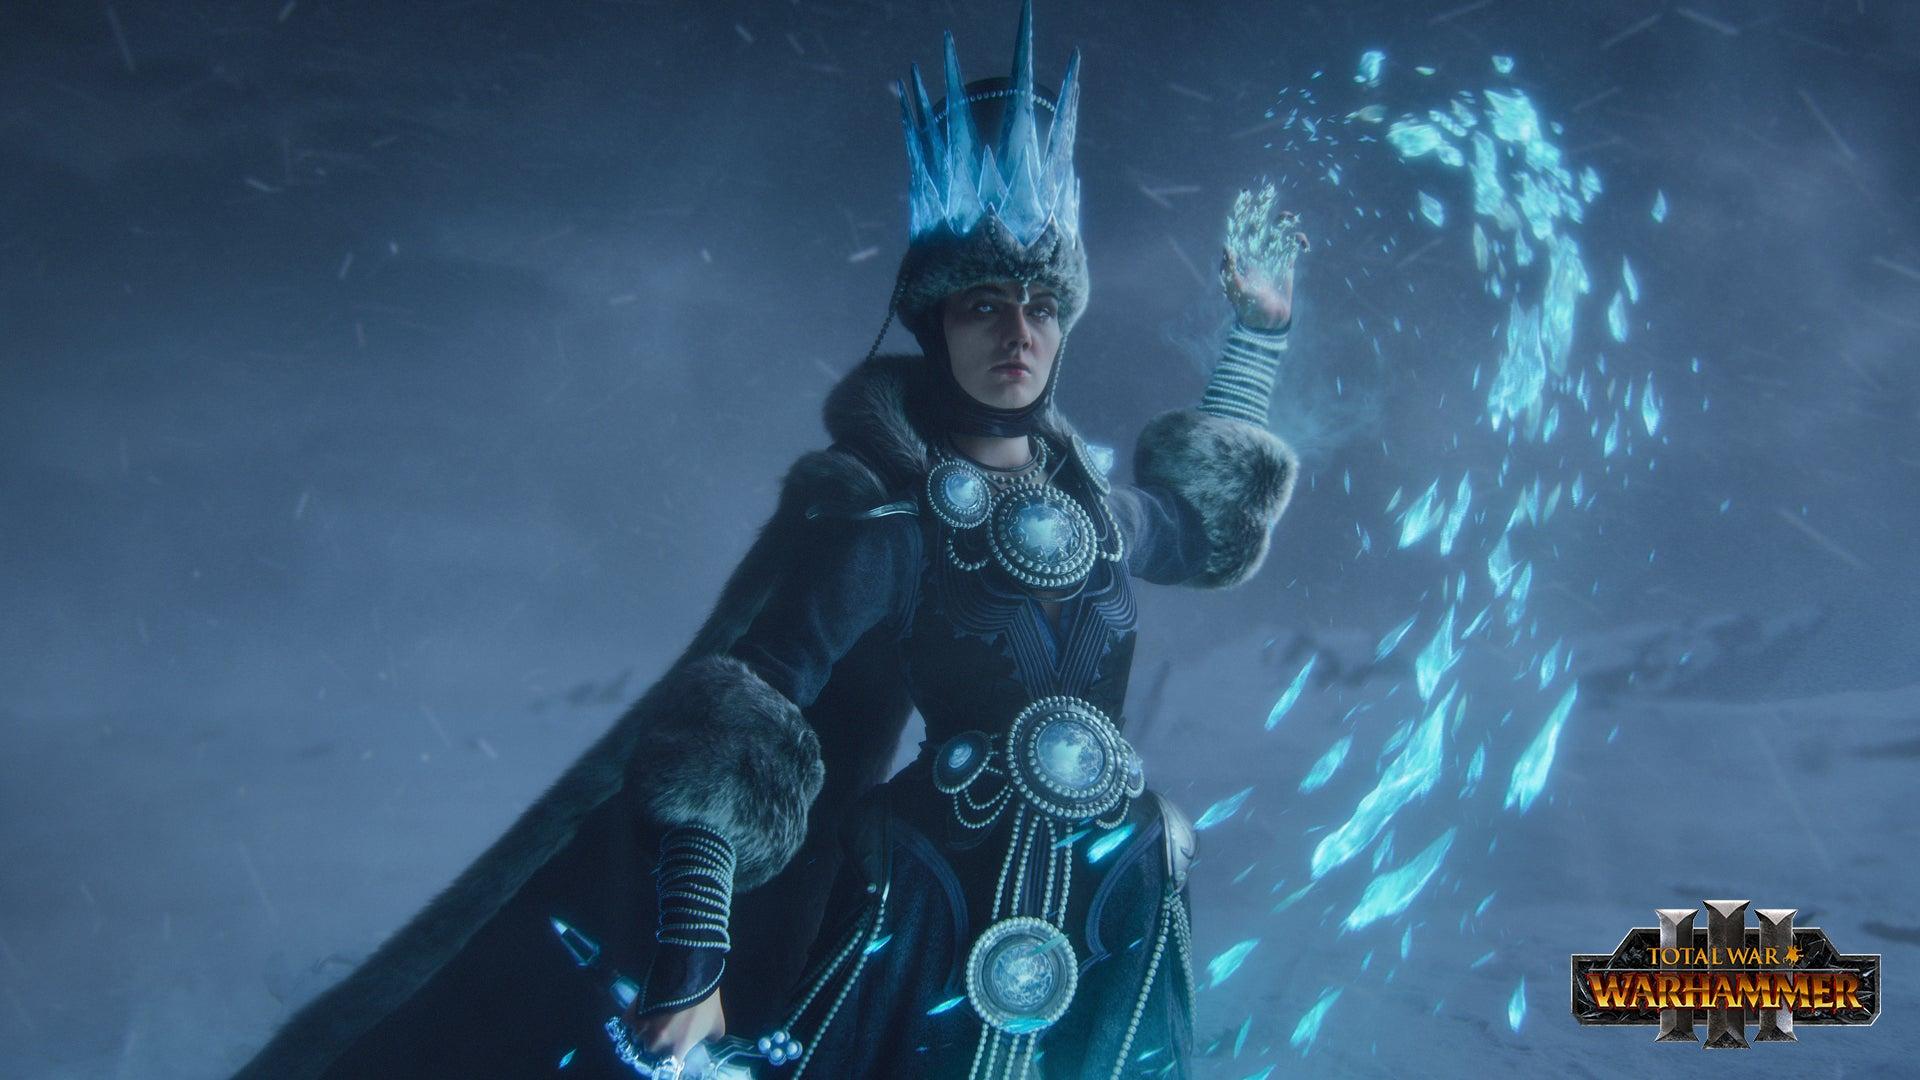 Image for Total War: Warhammer 3 gameplay debut shows off tower defence-inspired Survival Battles